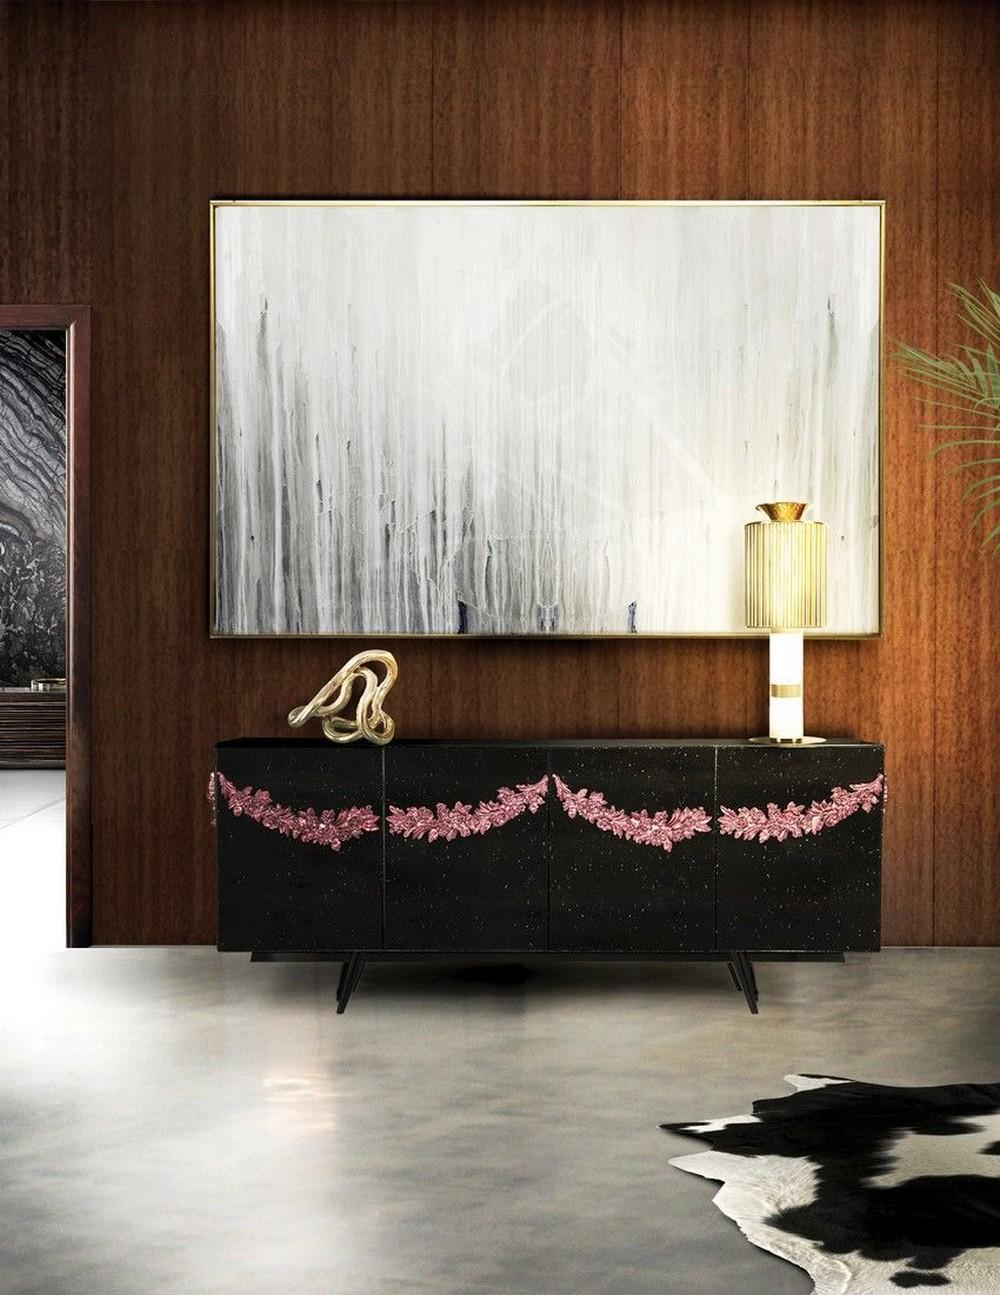 Luxury Credenzas: Why Black Interiors Are Always On Trend luxury credenzas Luxury Credenzas: Why Black Interiors Are Always On Trend luxury credenzas why black interiors are always trend 5